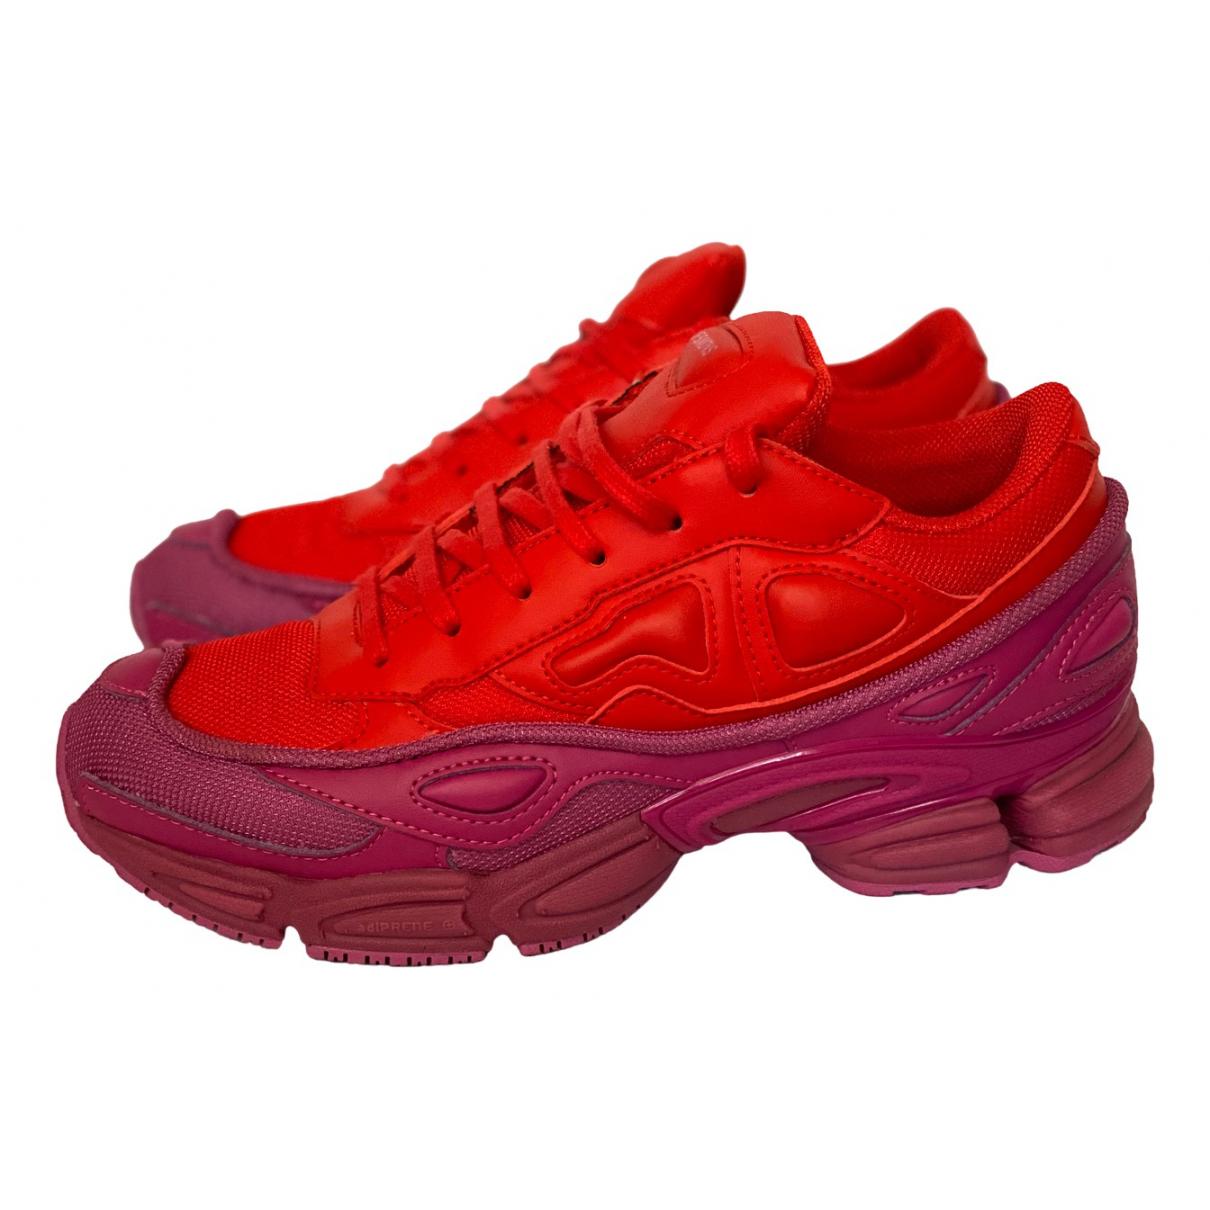 Adidas X Raf Simons Ozweego 2 Red Leather Trainers